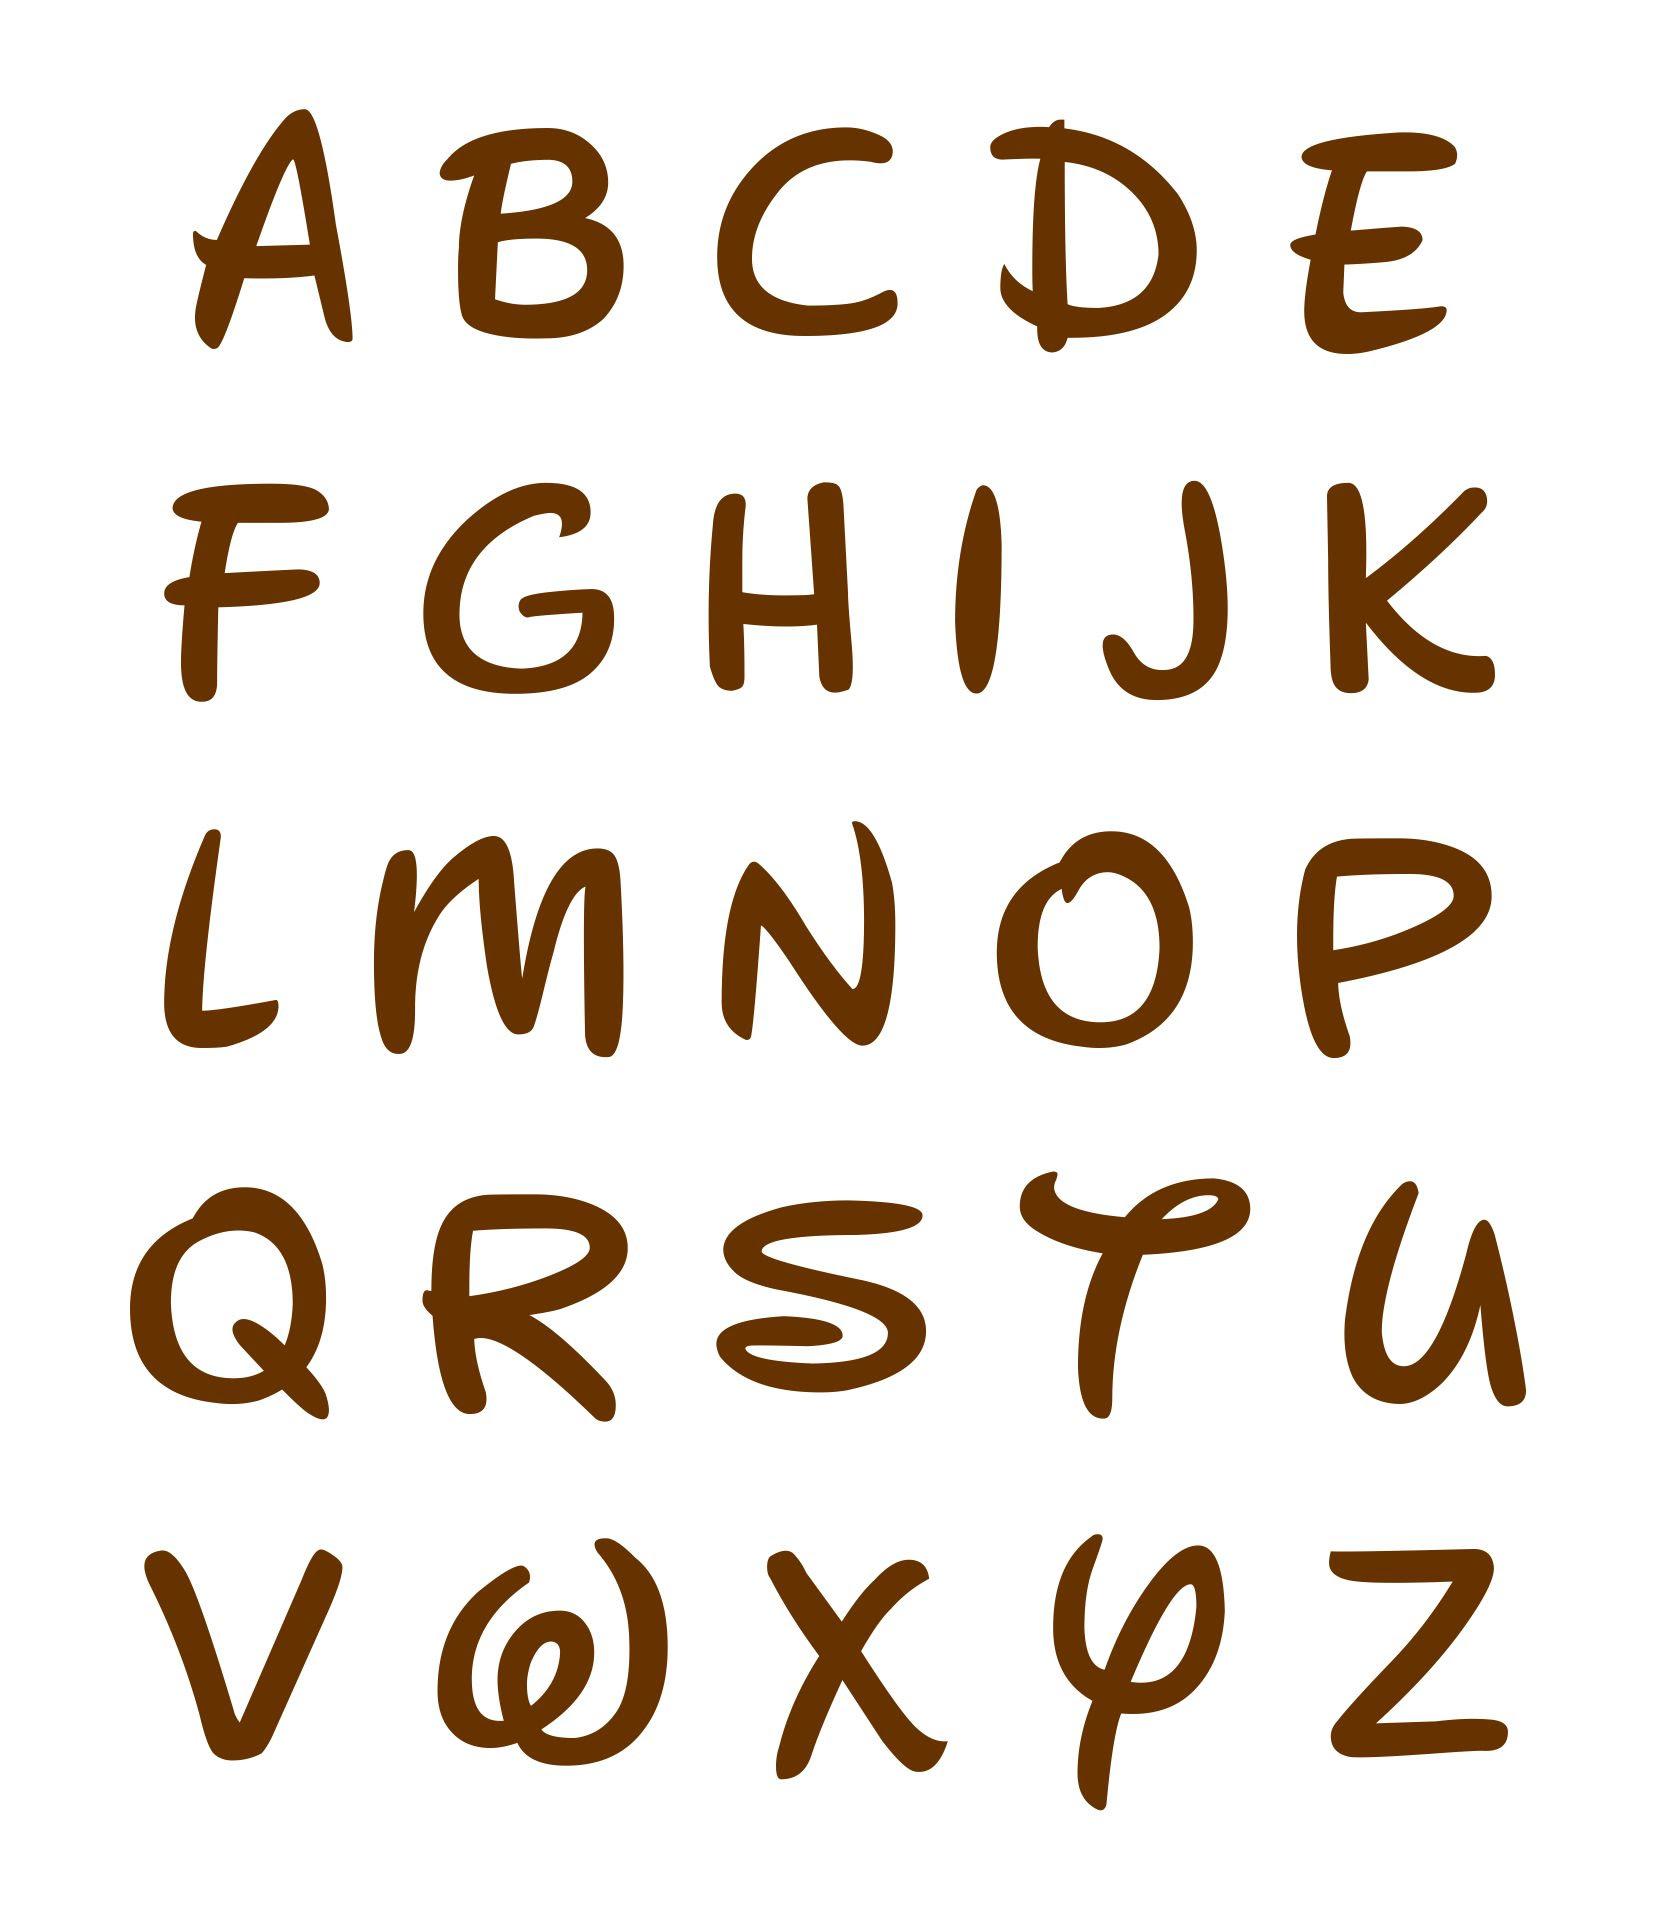 Disney Font Alphabet - More information